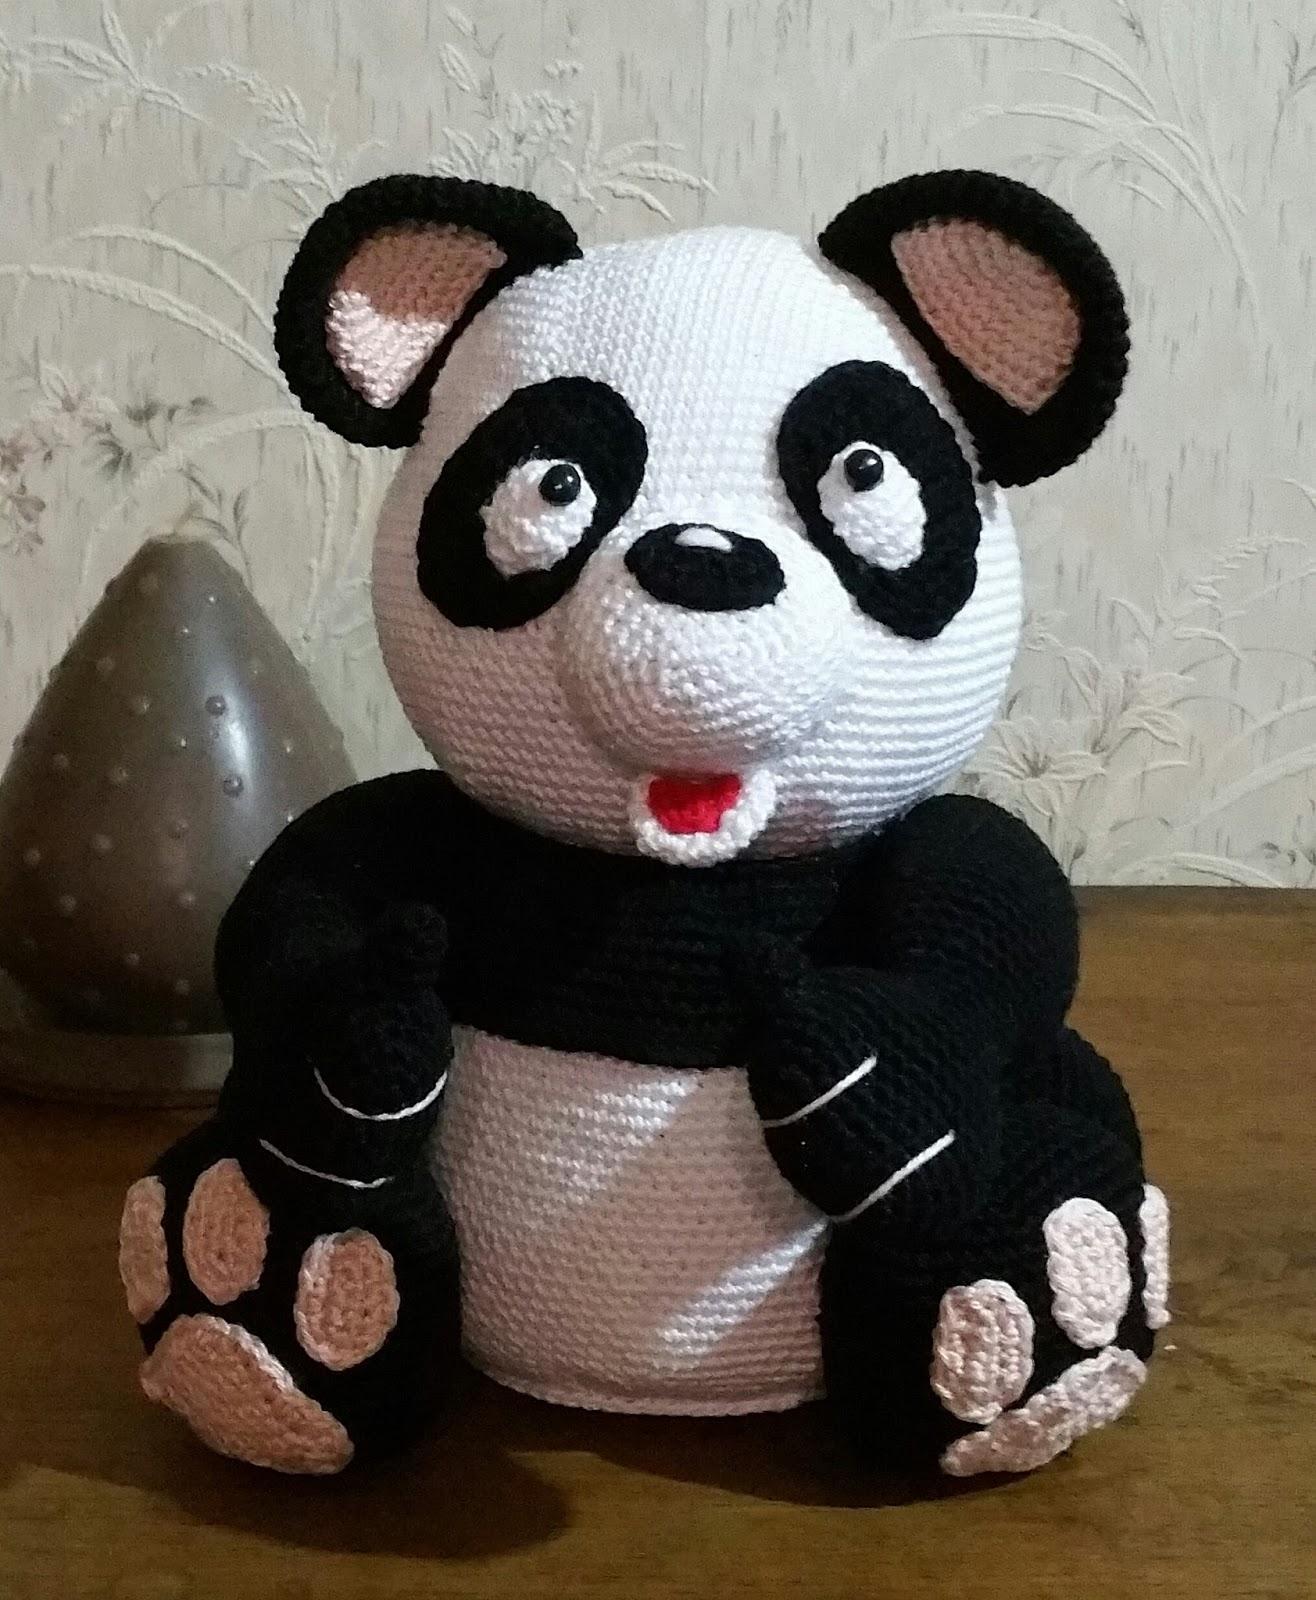 oso panda amigurumi gigante (tutorial) - YouTube | 1600x1316